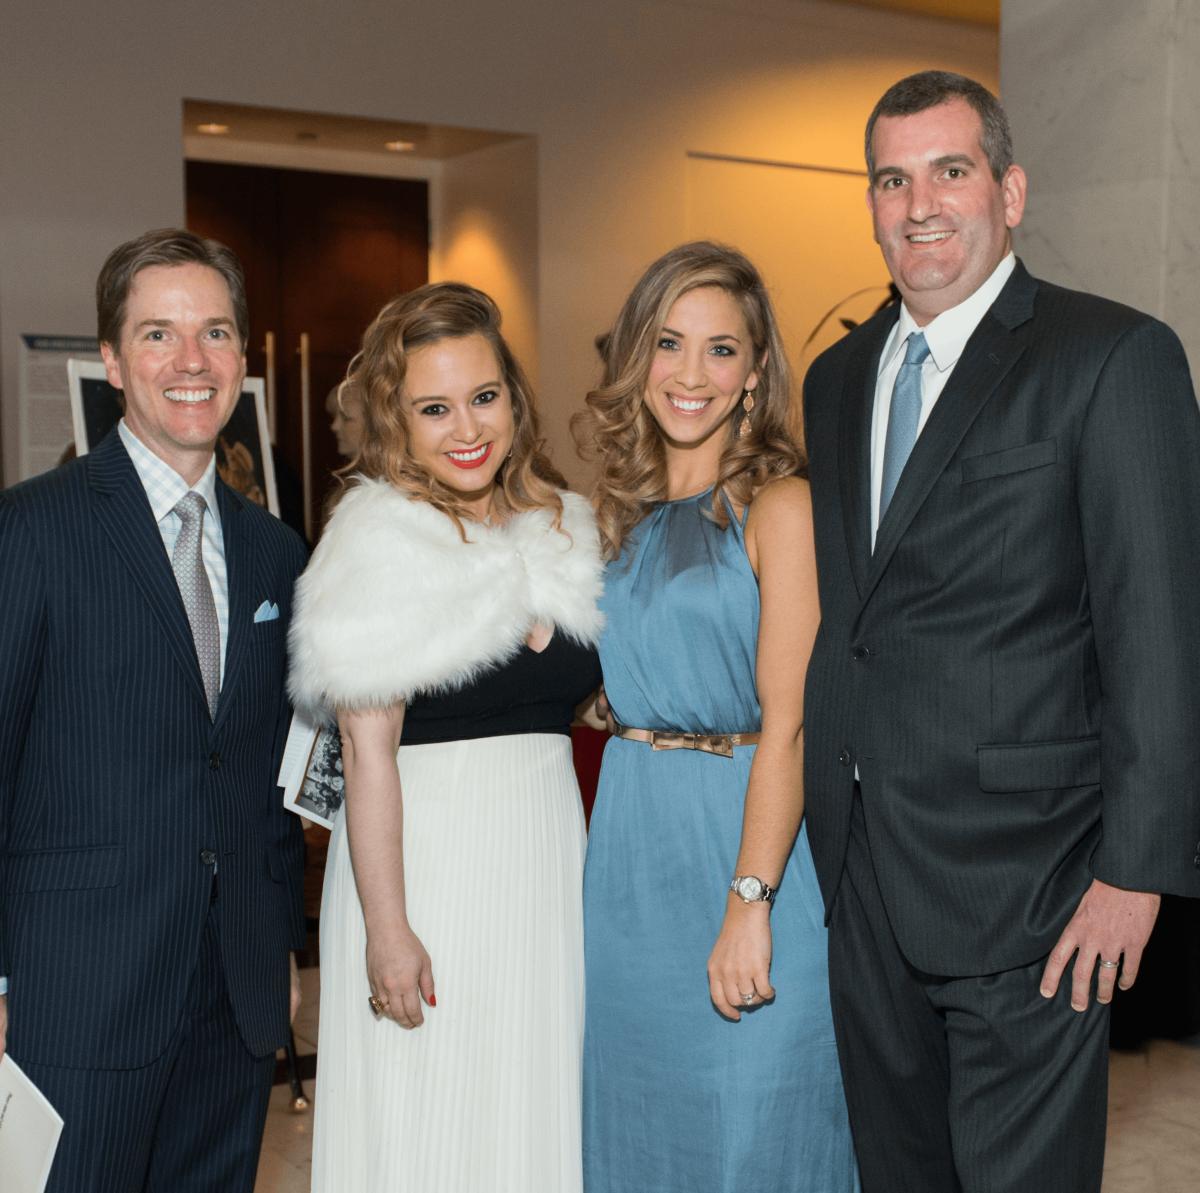 David Kennedy, Megan Blaisdell, Bethany Hibbetts, Matthew Hibbetts at Mission of Yahweh gala